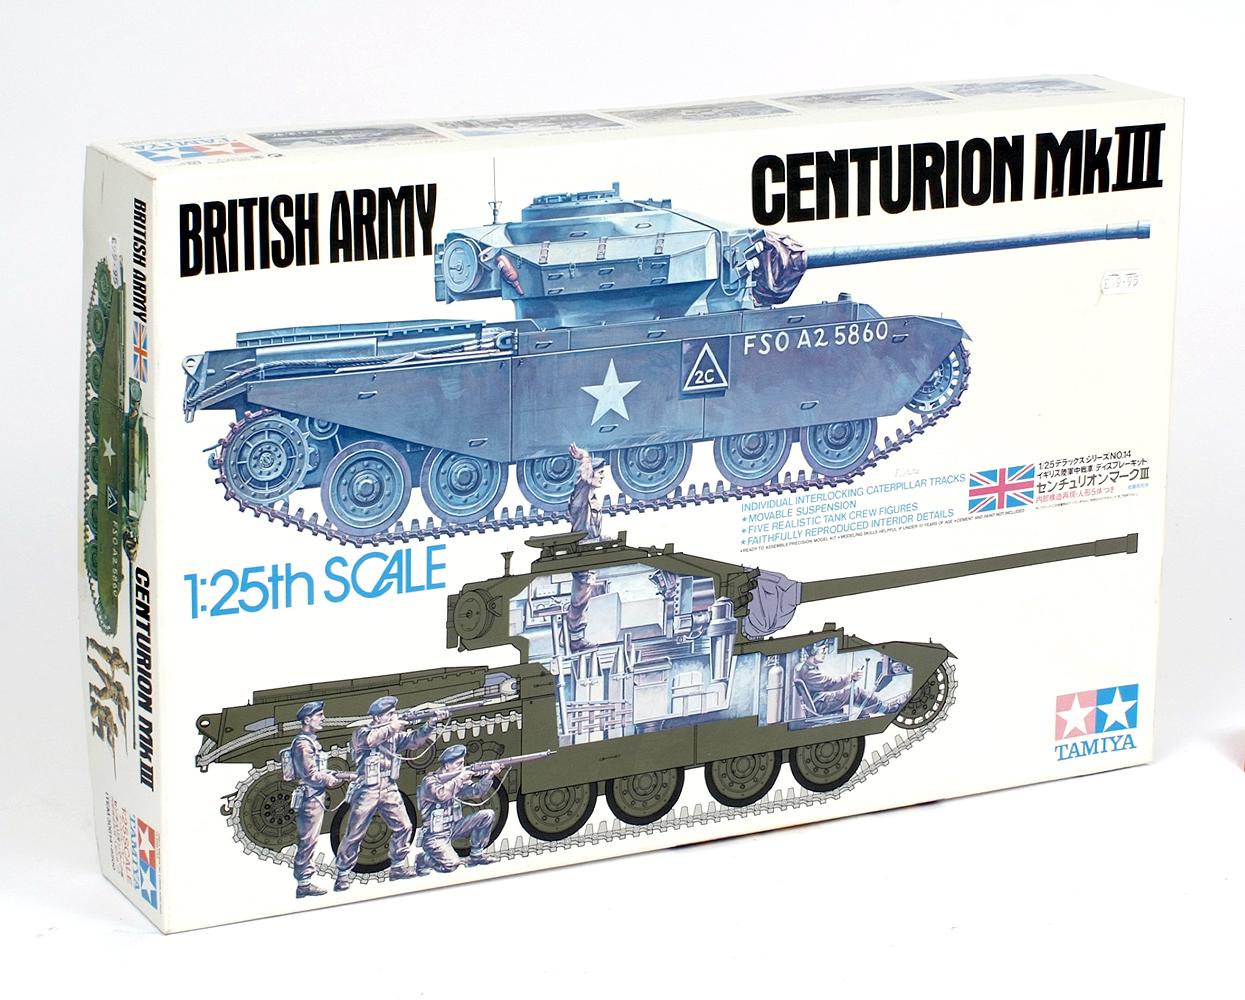 Lot 18 - Tamiya 30614-8500 1:25 scale British Army Centurion MkIII tank plastic model kit.